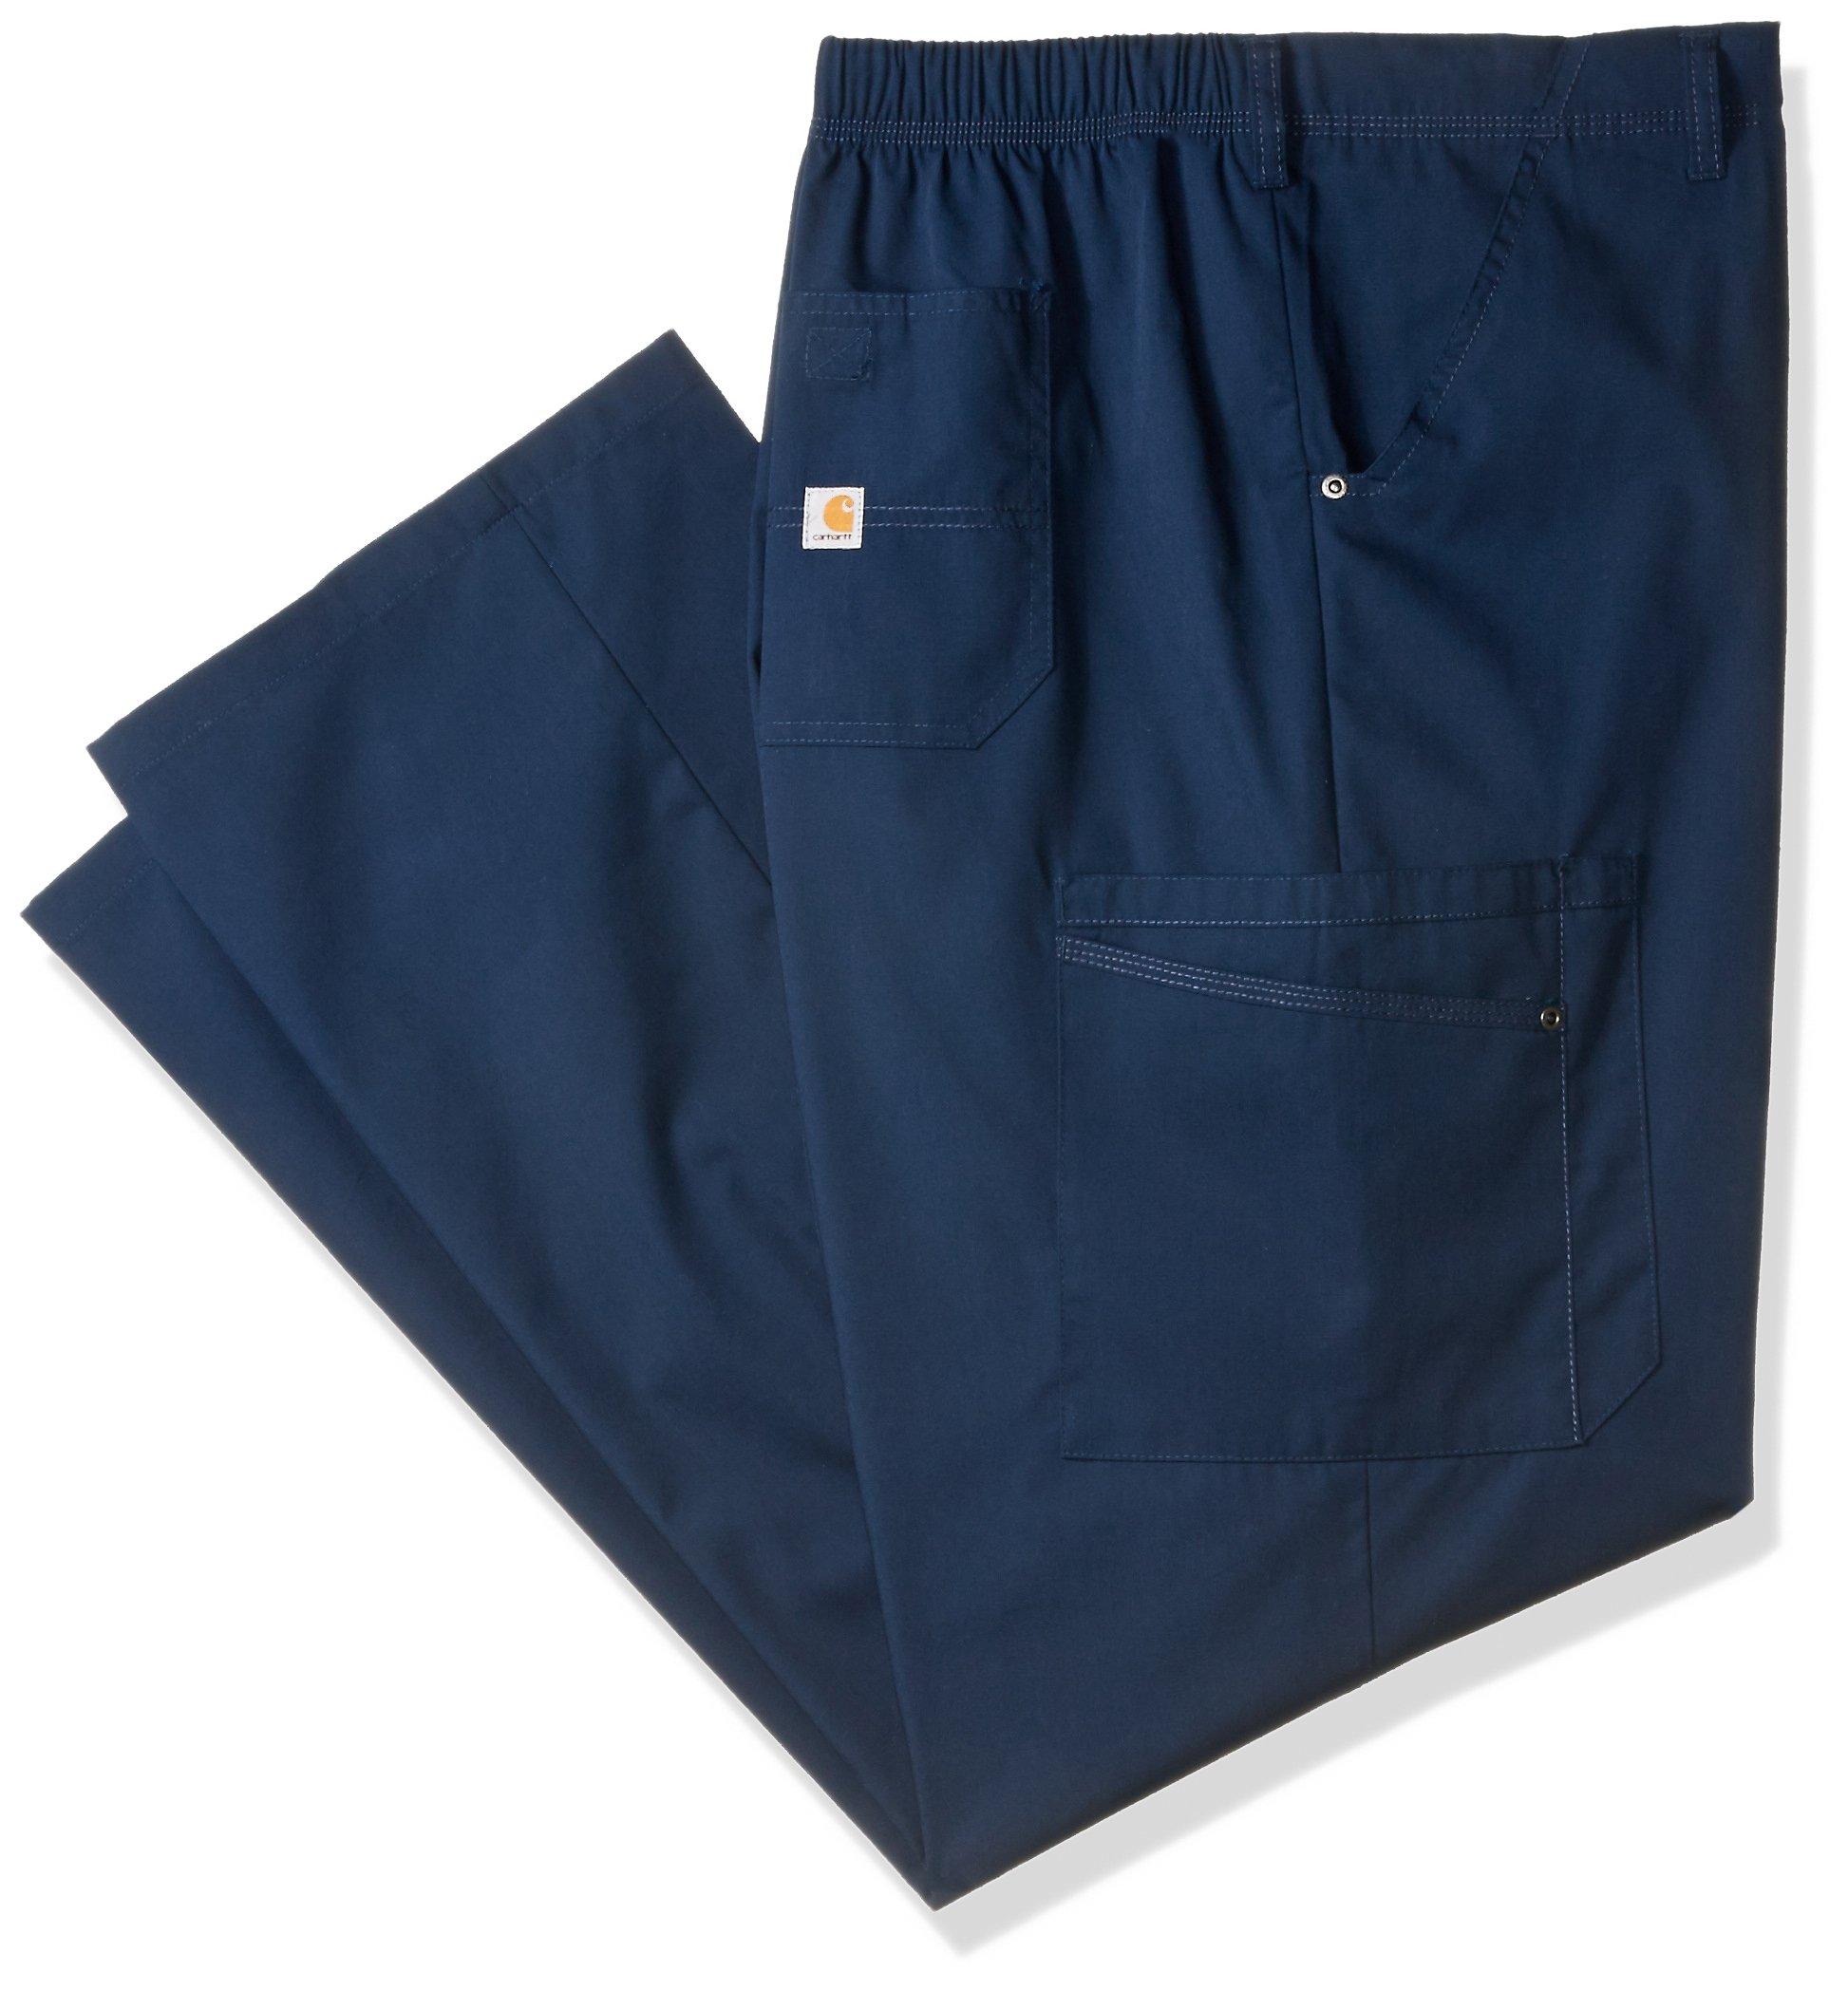 Carhartt Men's Rockwall Cargo Scrub Pant, Navy, X-Large